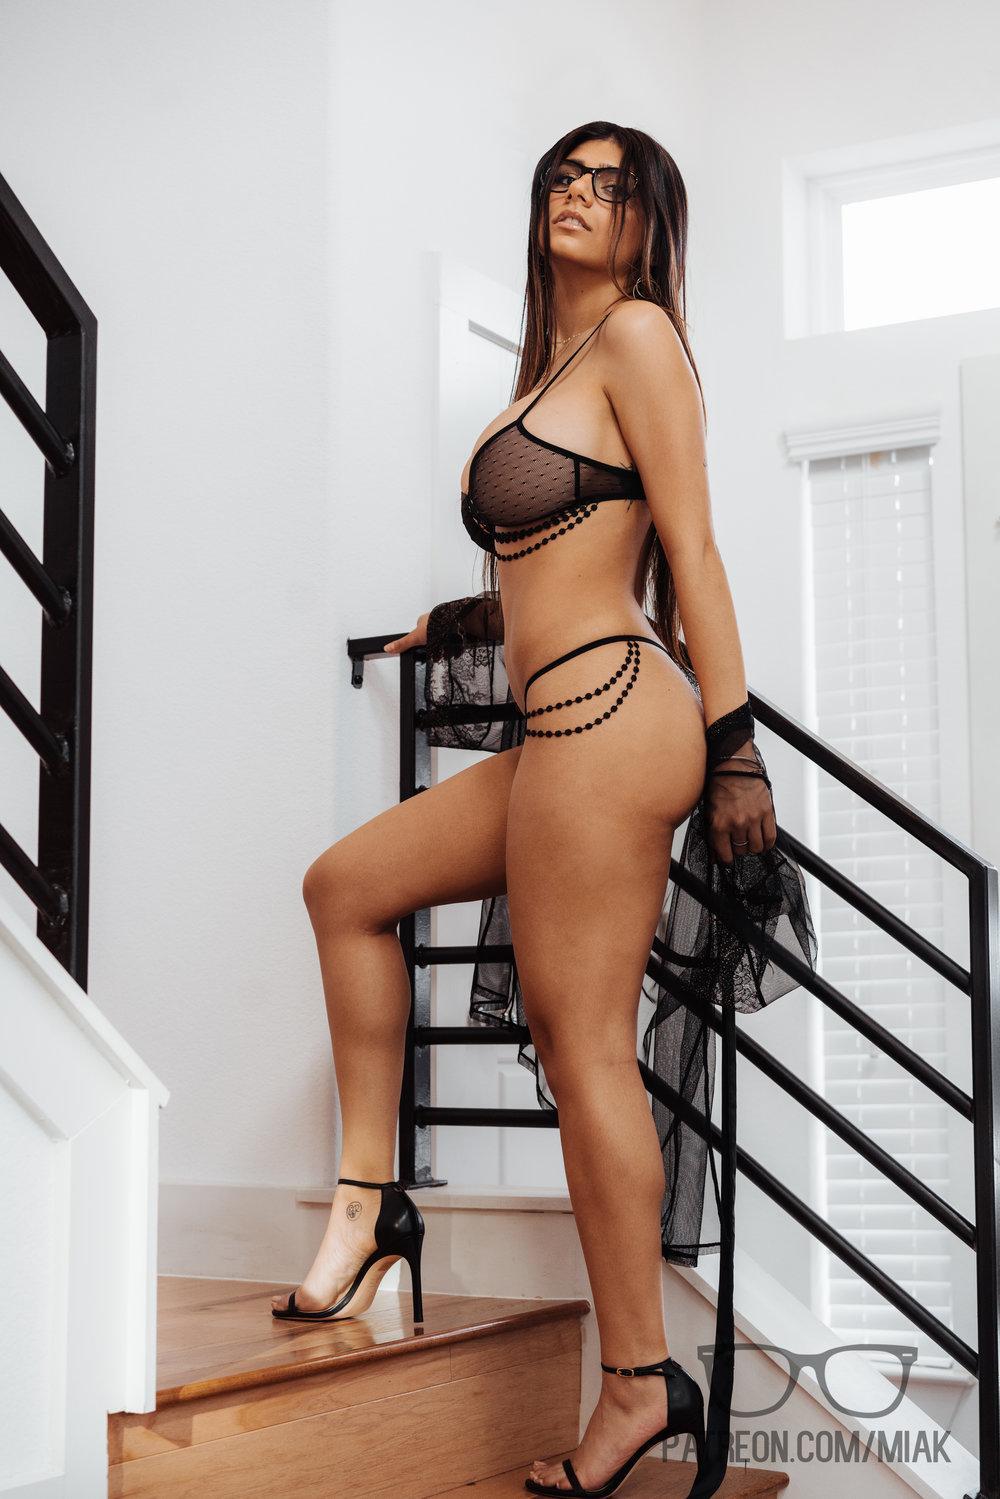 Mia Khalifa Lingerie Stiletto Heels Photoshoot Leaked 0001